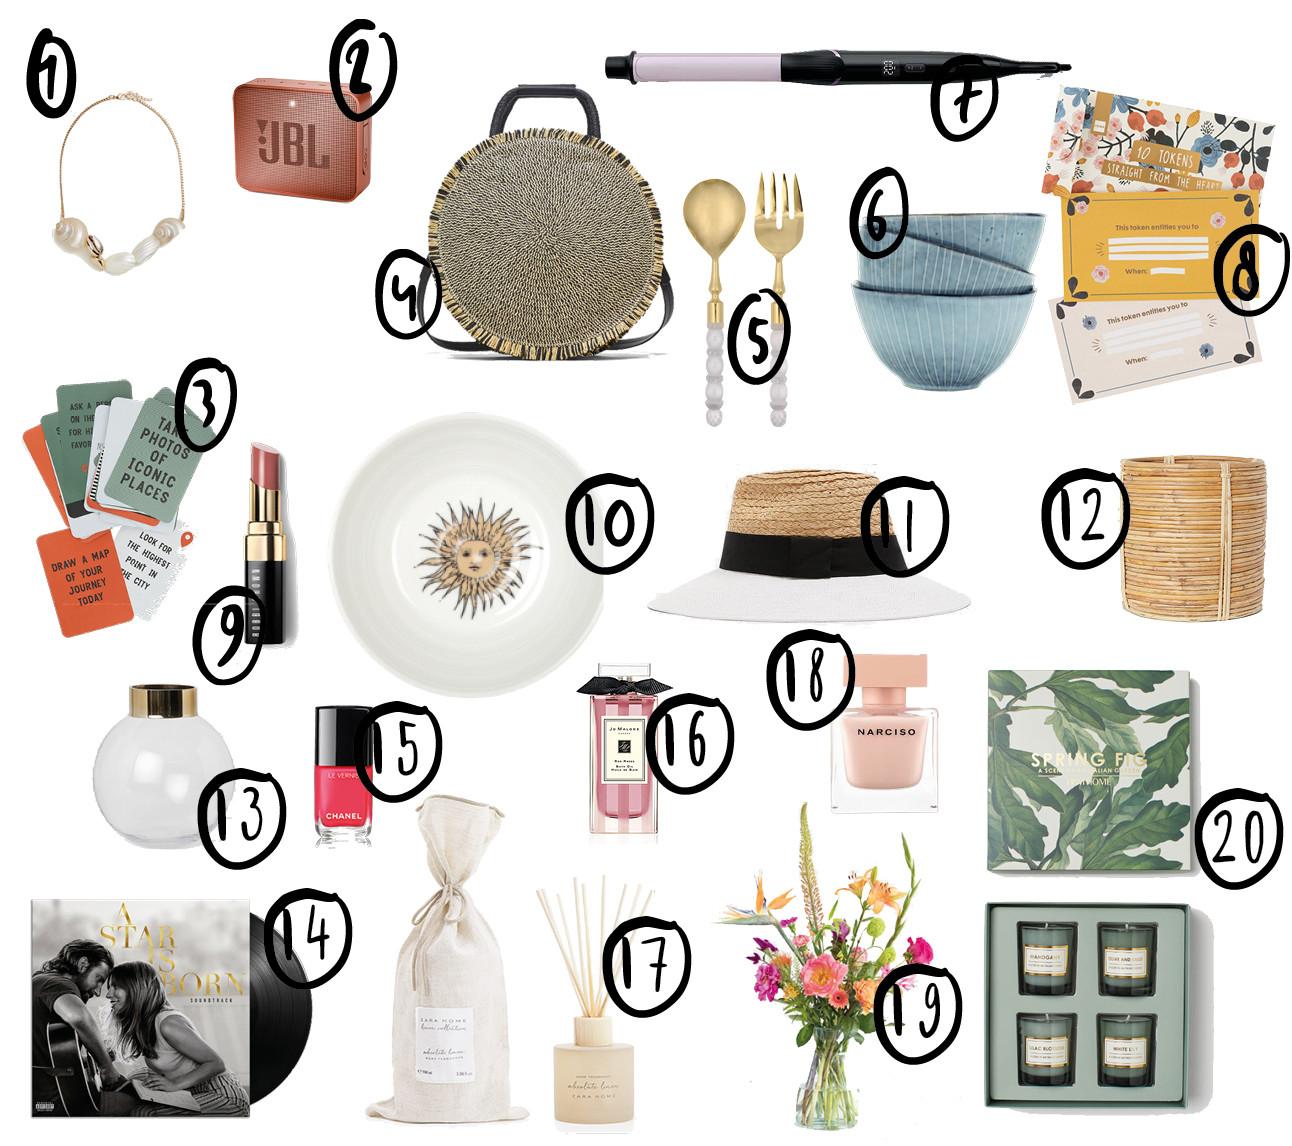 moederdag shopping, geurkaarsen, bloemen, parfum, servies. sieraden